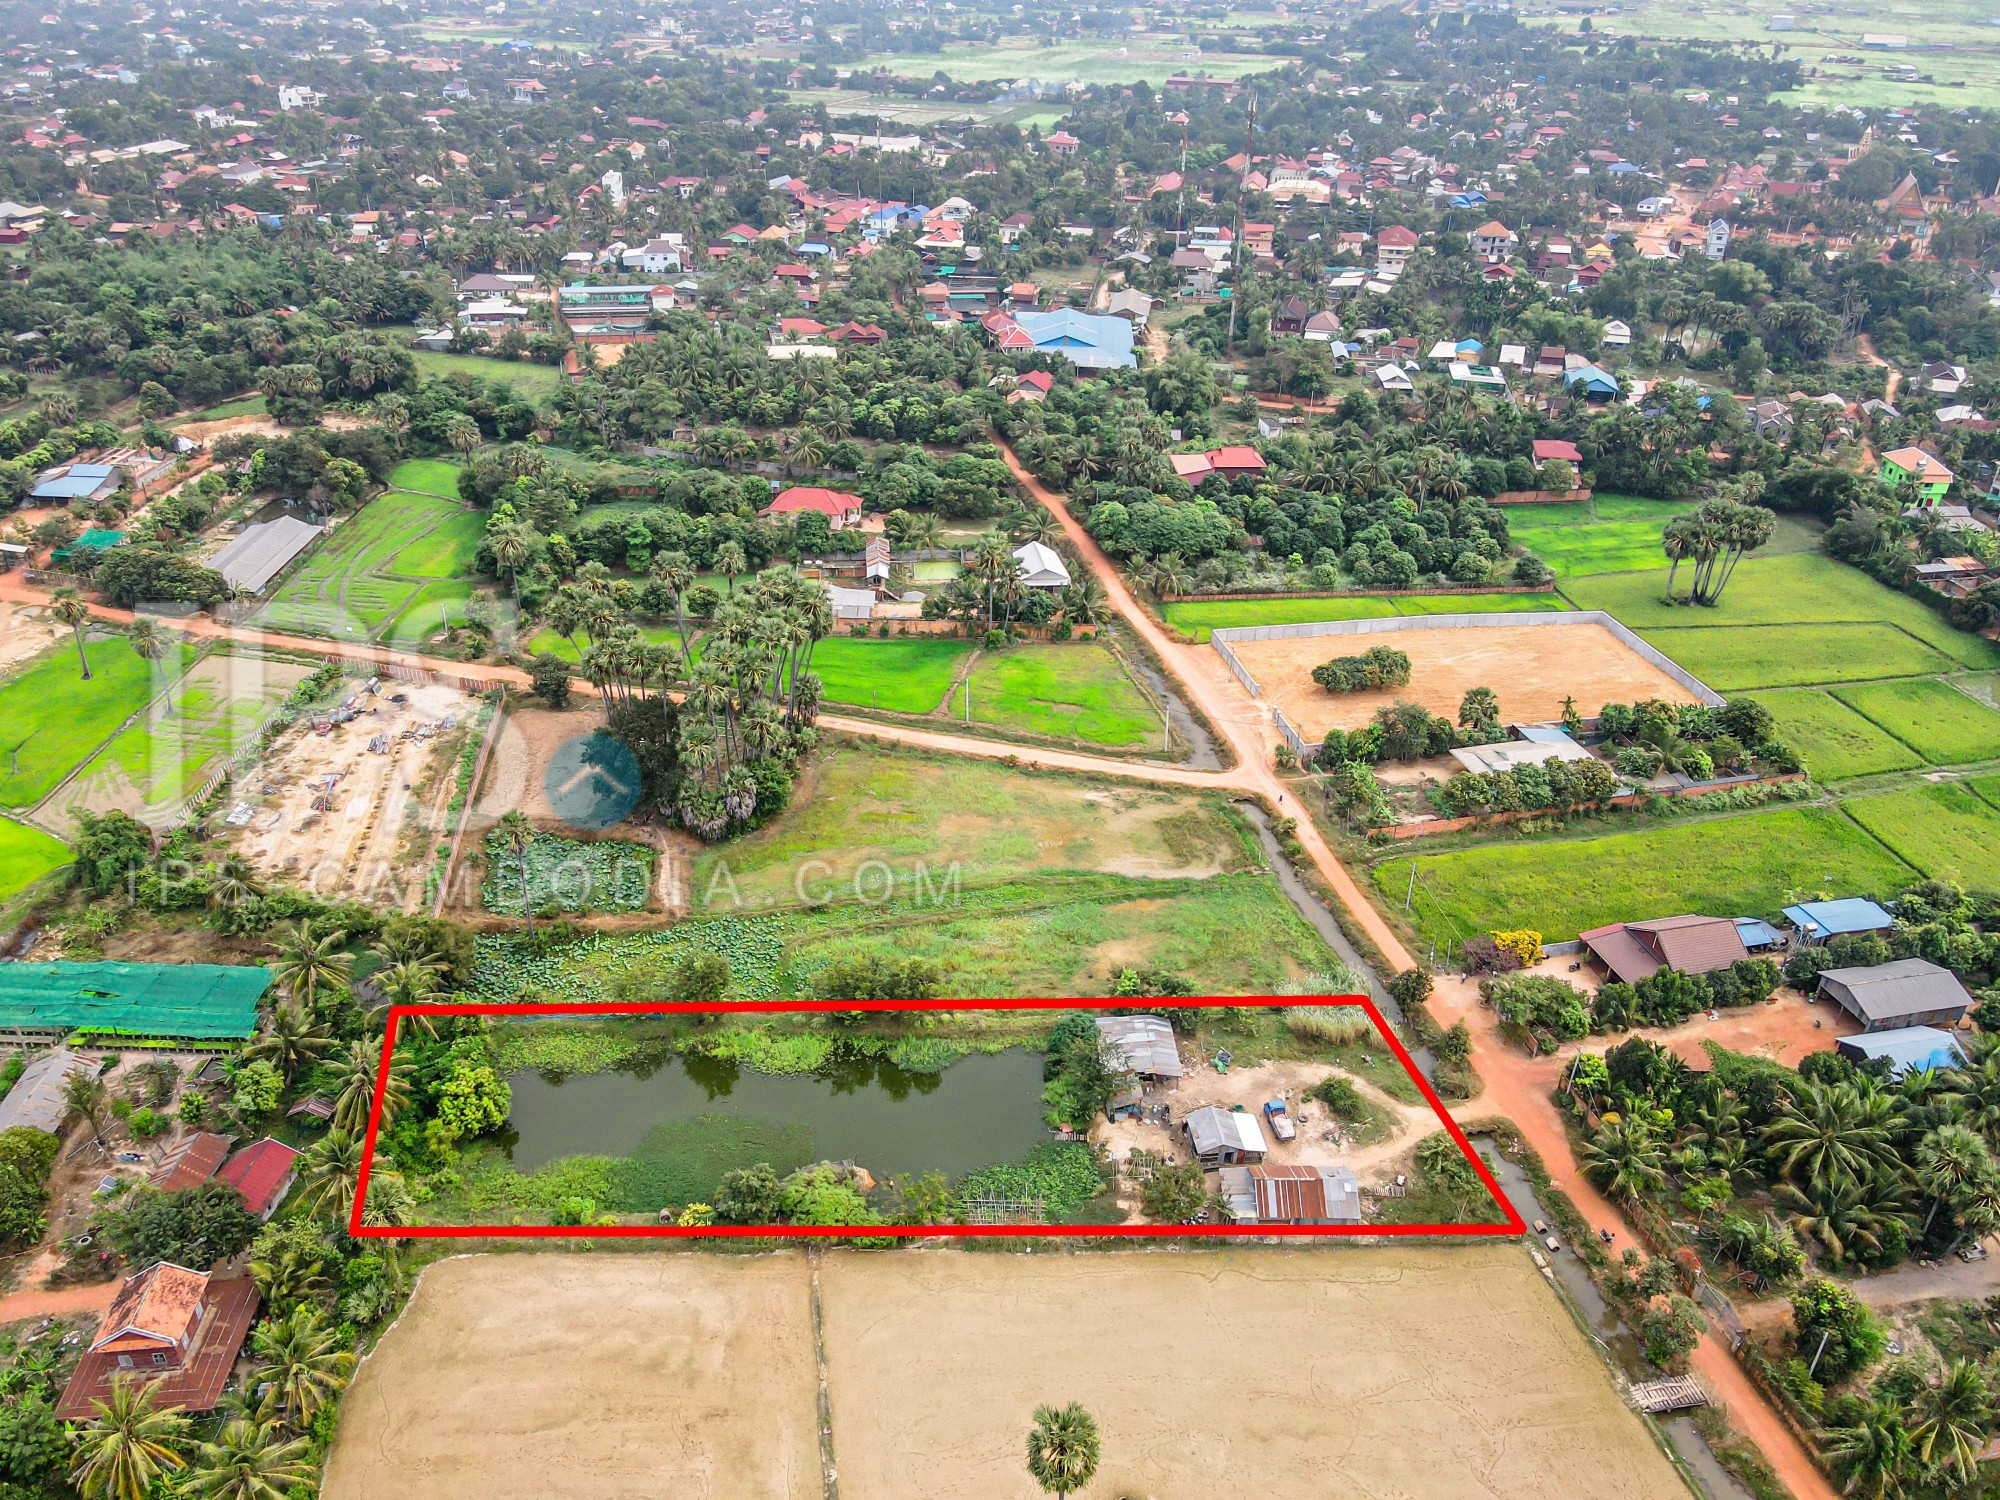 3444 Sqm Land For Sale - Wat Athvea, Siem Reap